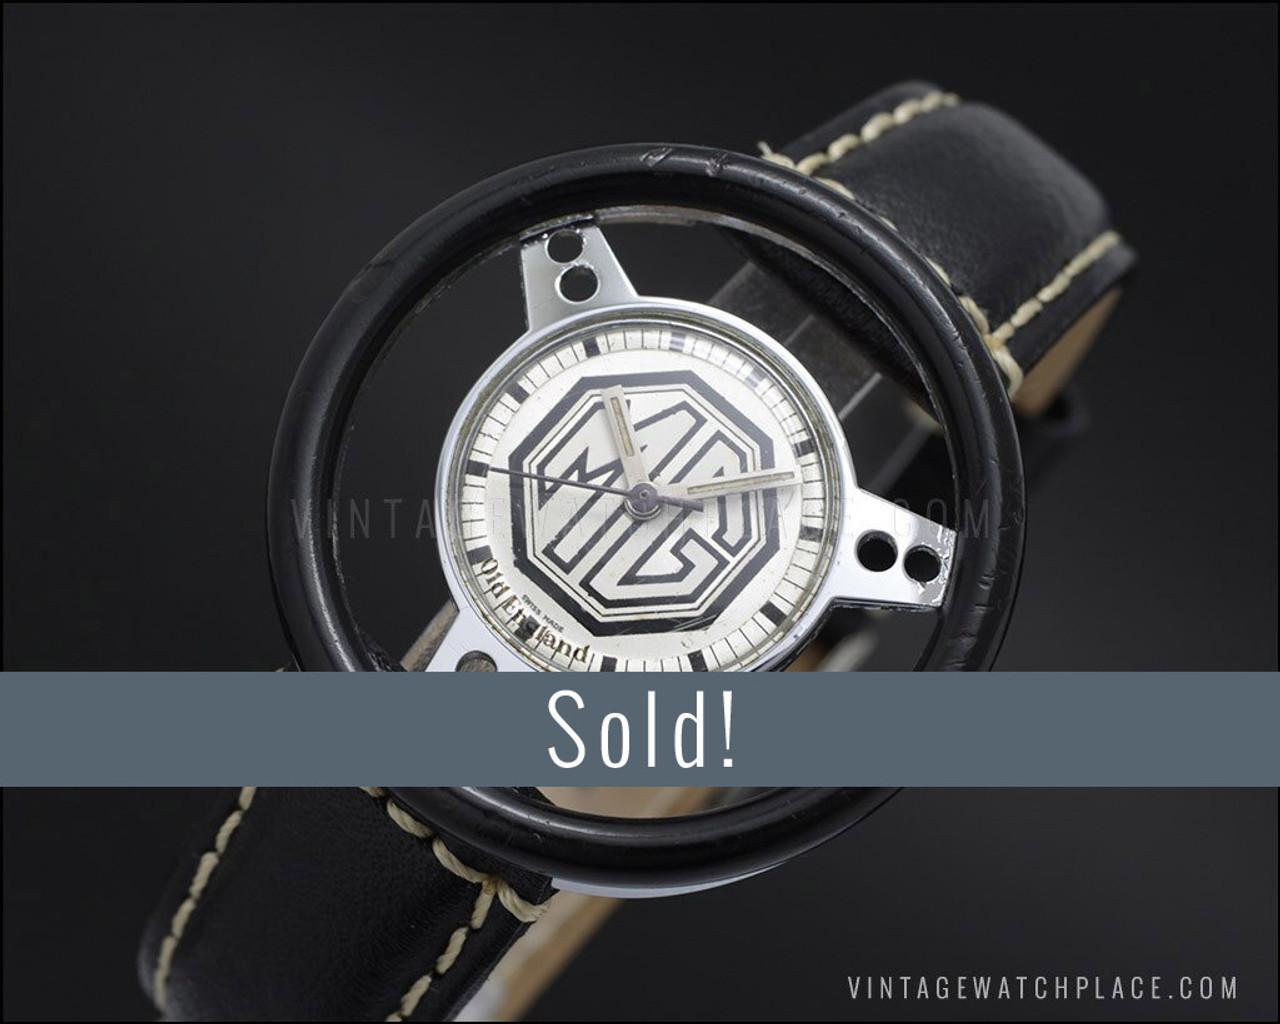 MG cars Old England Steering wheel Swiss made mechanical vintage watch